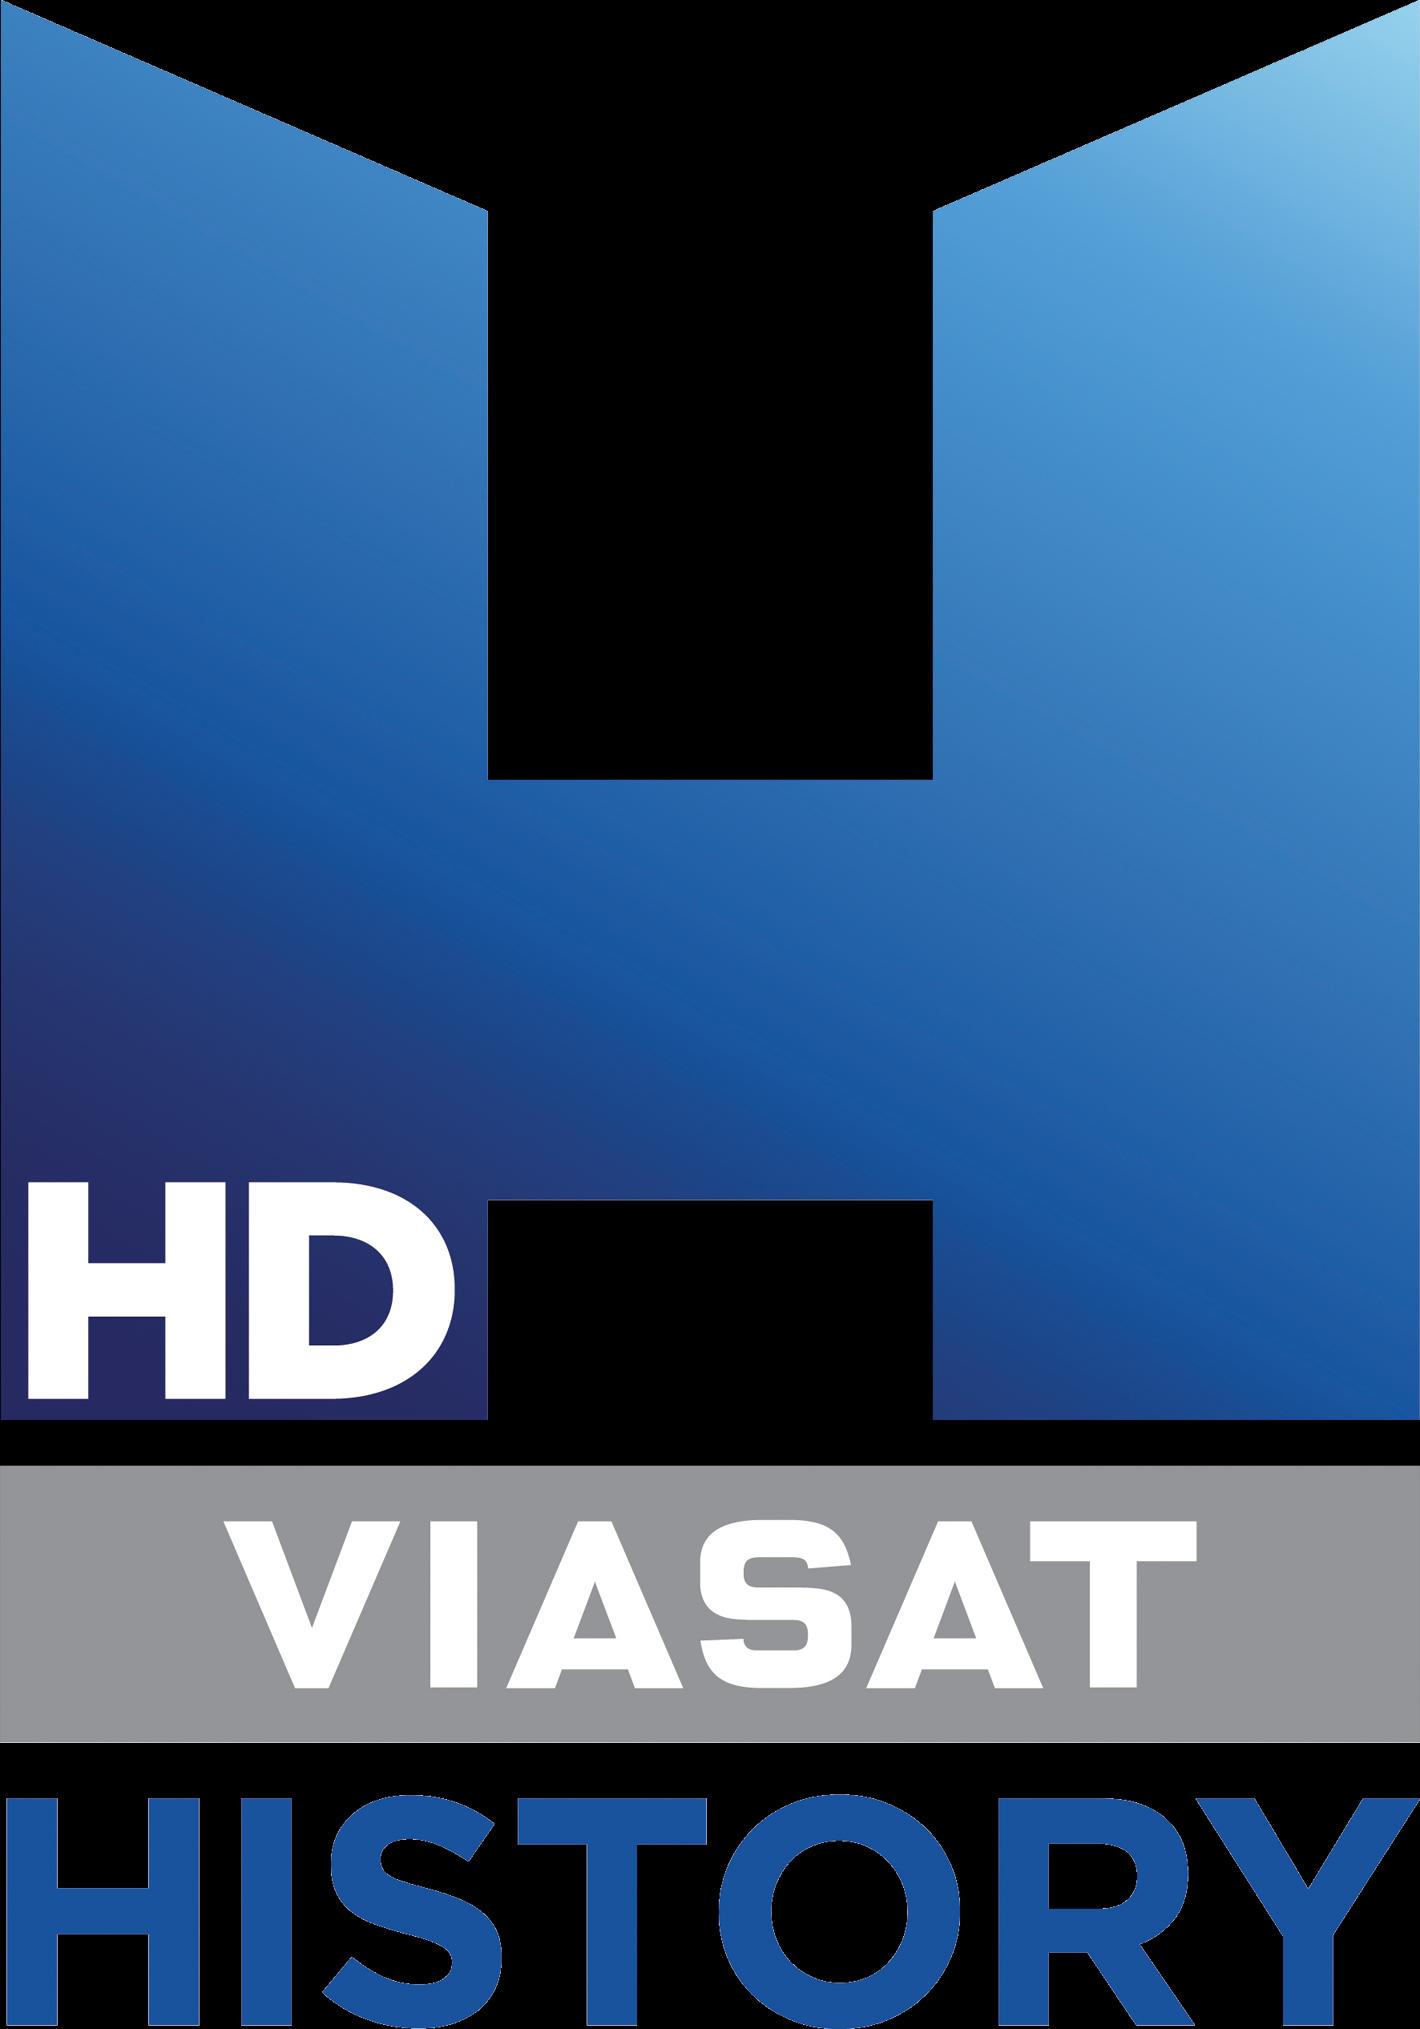 Viasat History HD 3.png